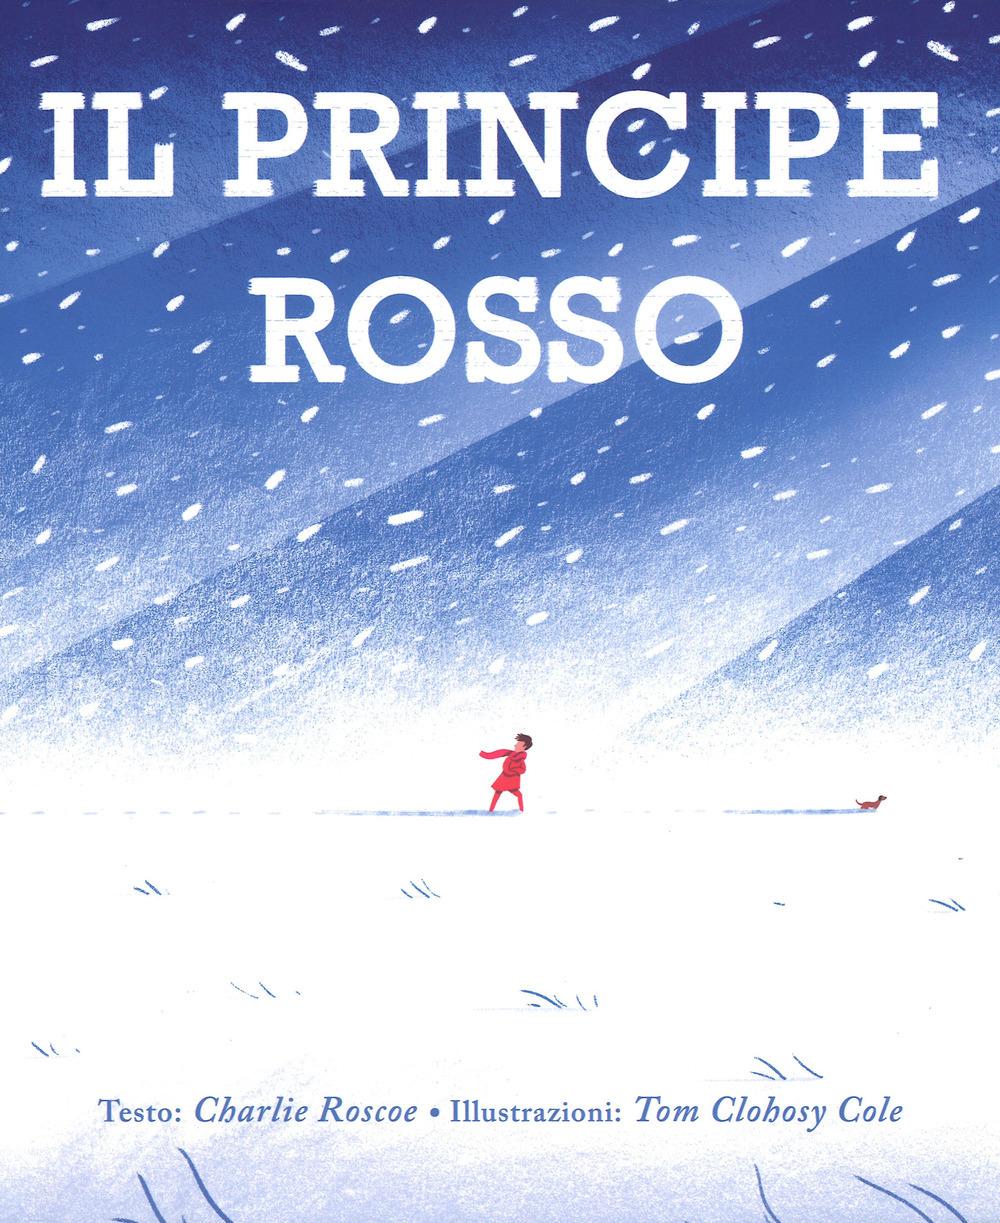 Image For Il principe rosso Roscoe Charlie